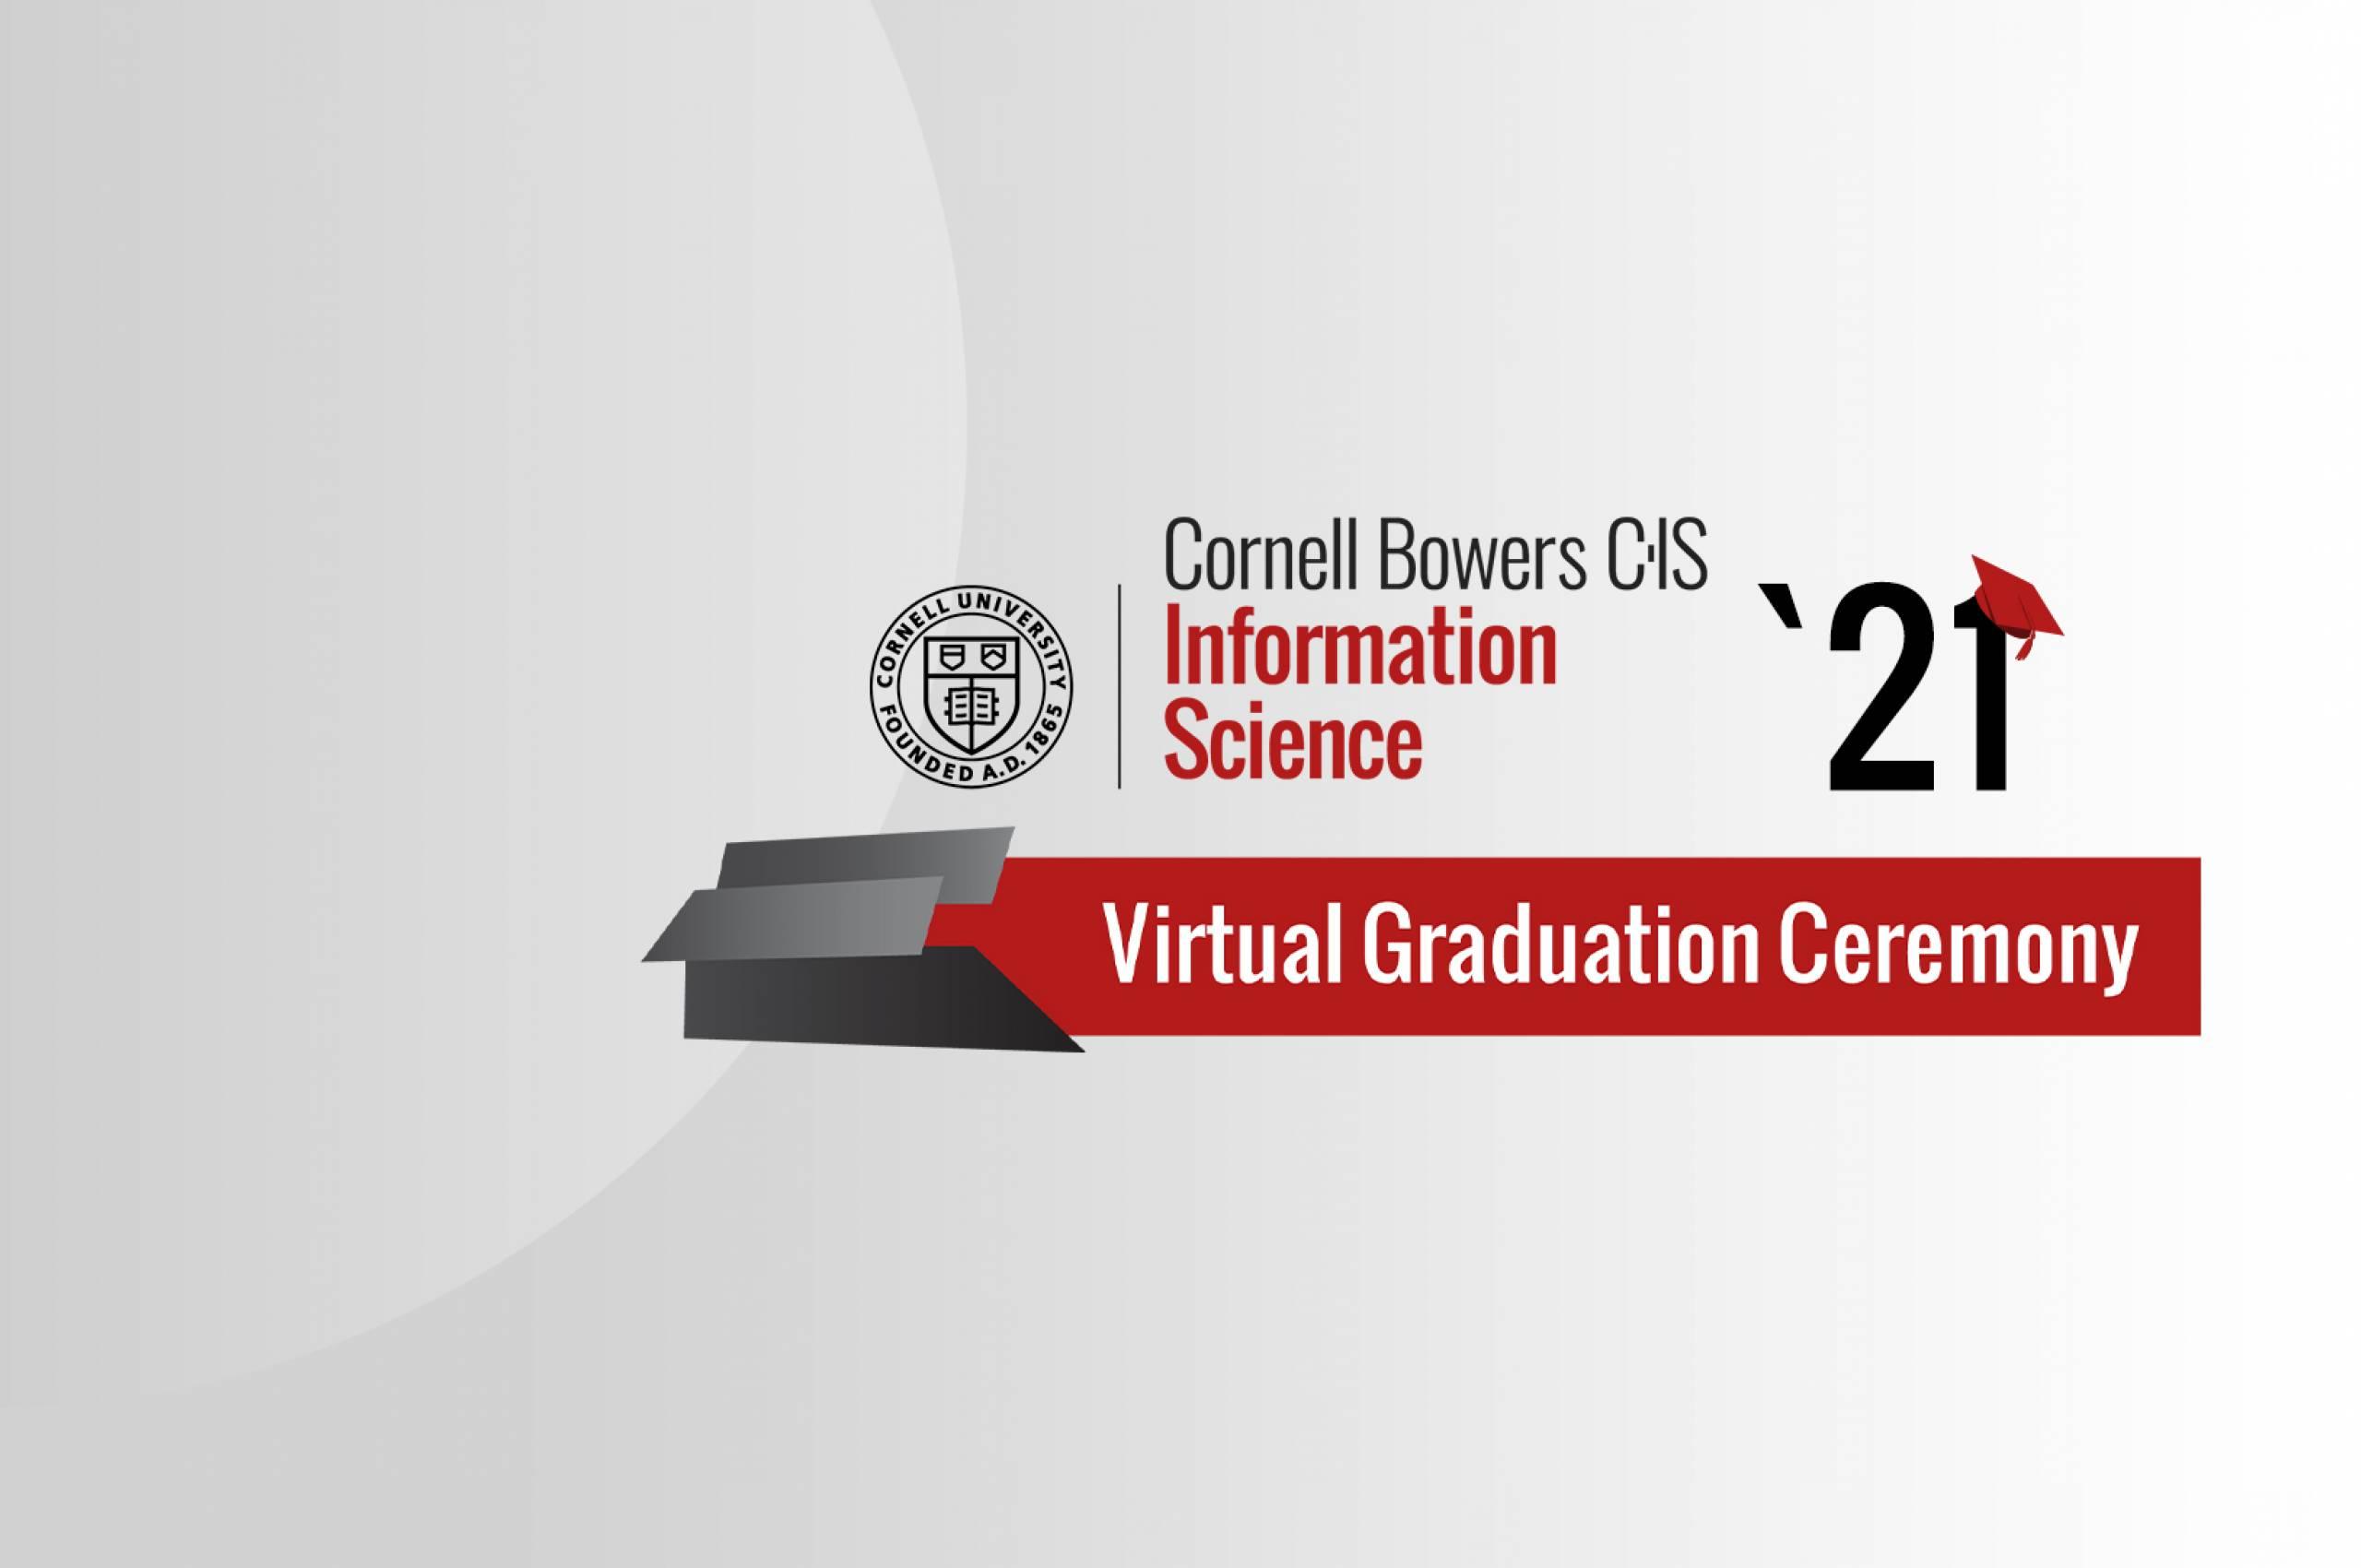 Info Sci Class of 2021 Virtual Graduation Ceremony